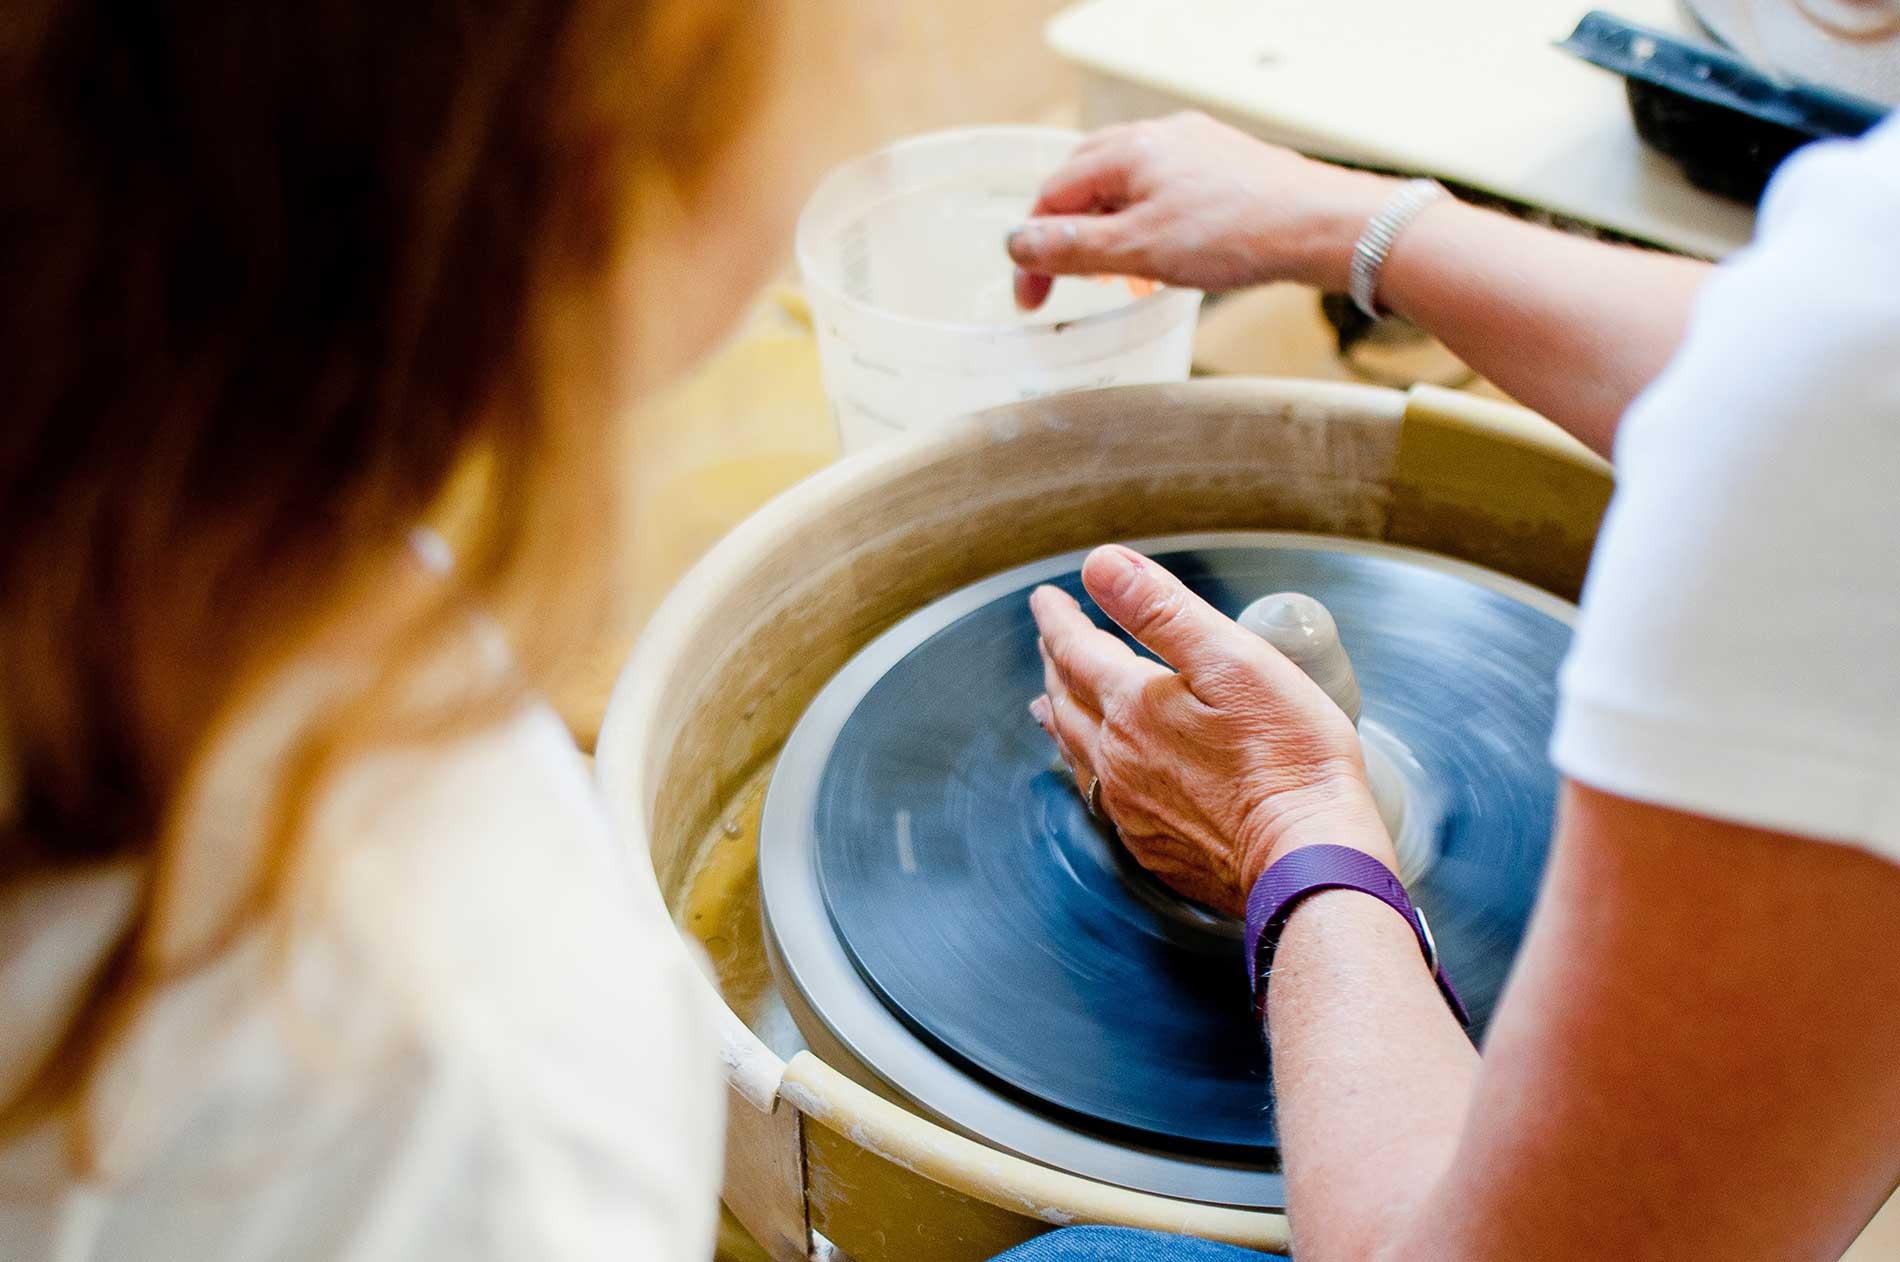 potter using a pottery wheel